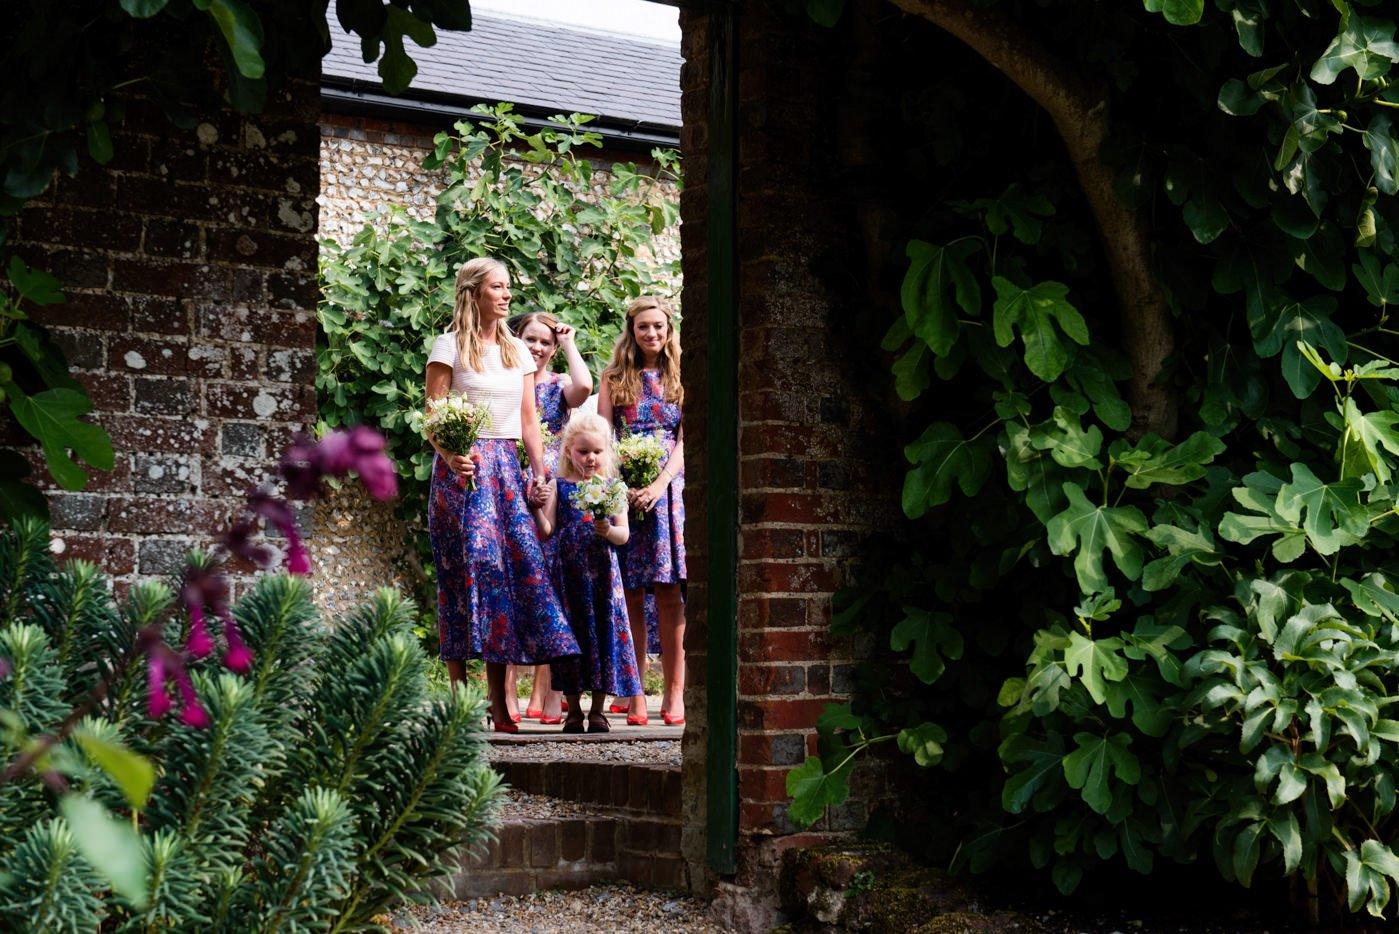 bignor-park-wedding-photography-robyn-and-tom-46